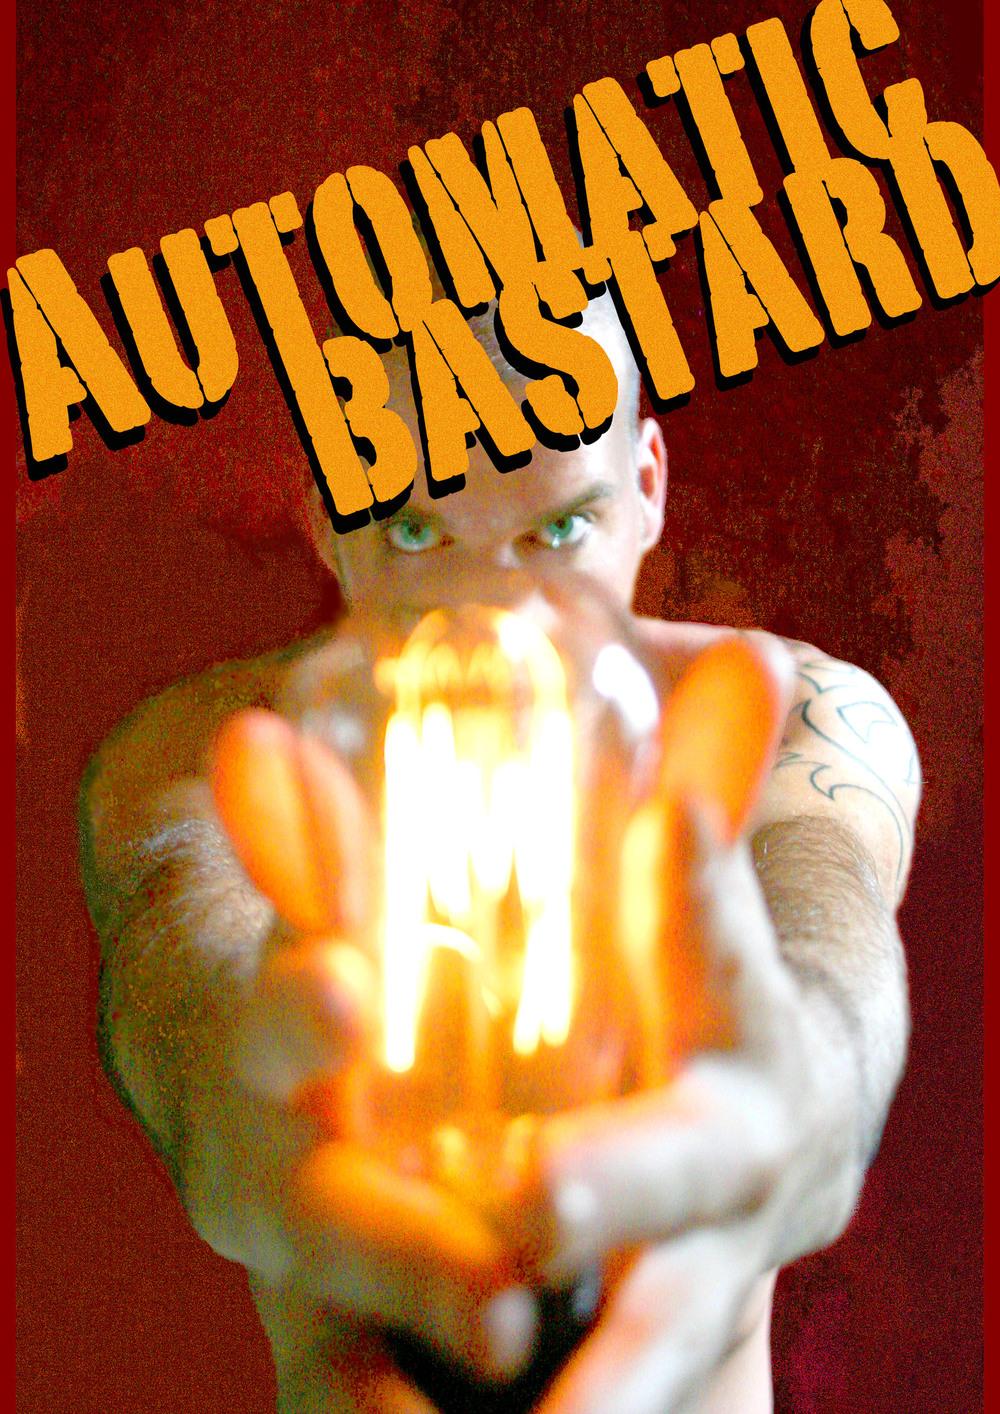 Automatic Bastard